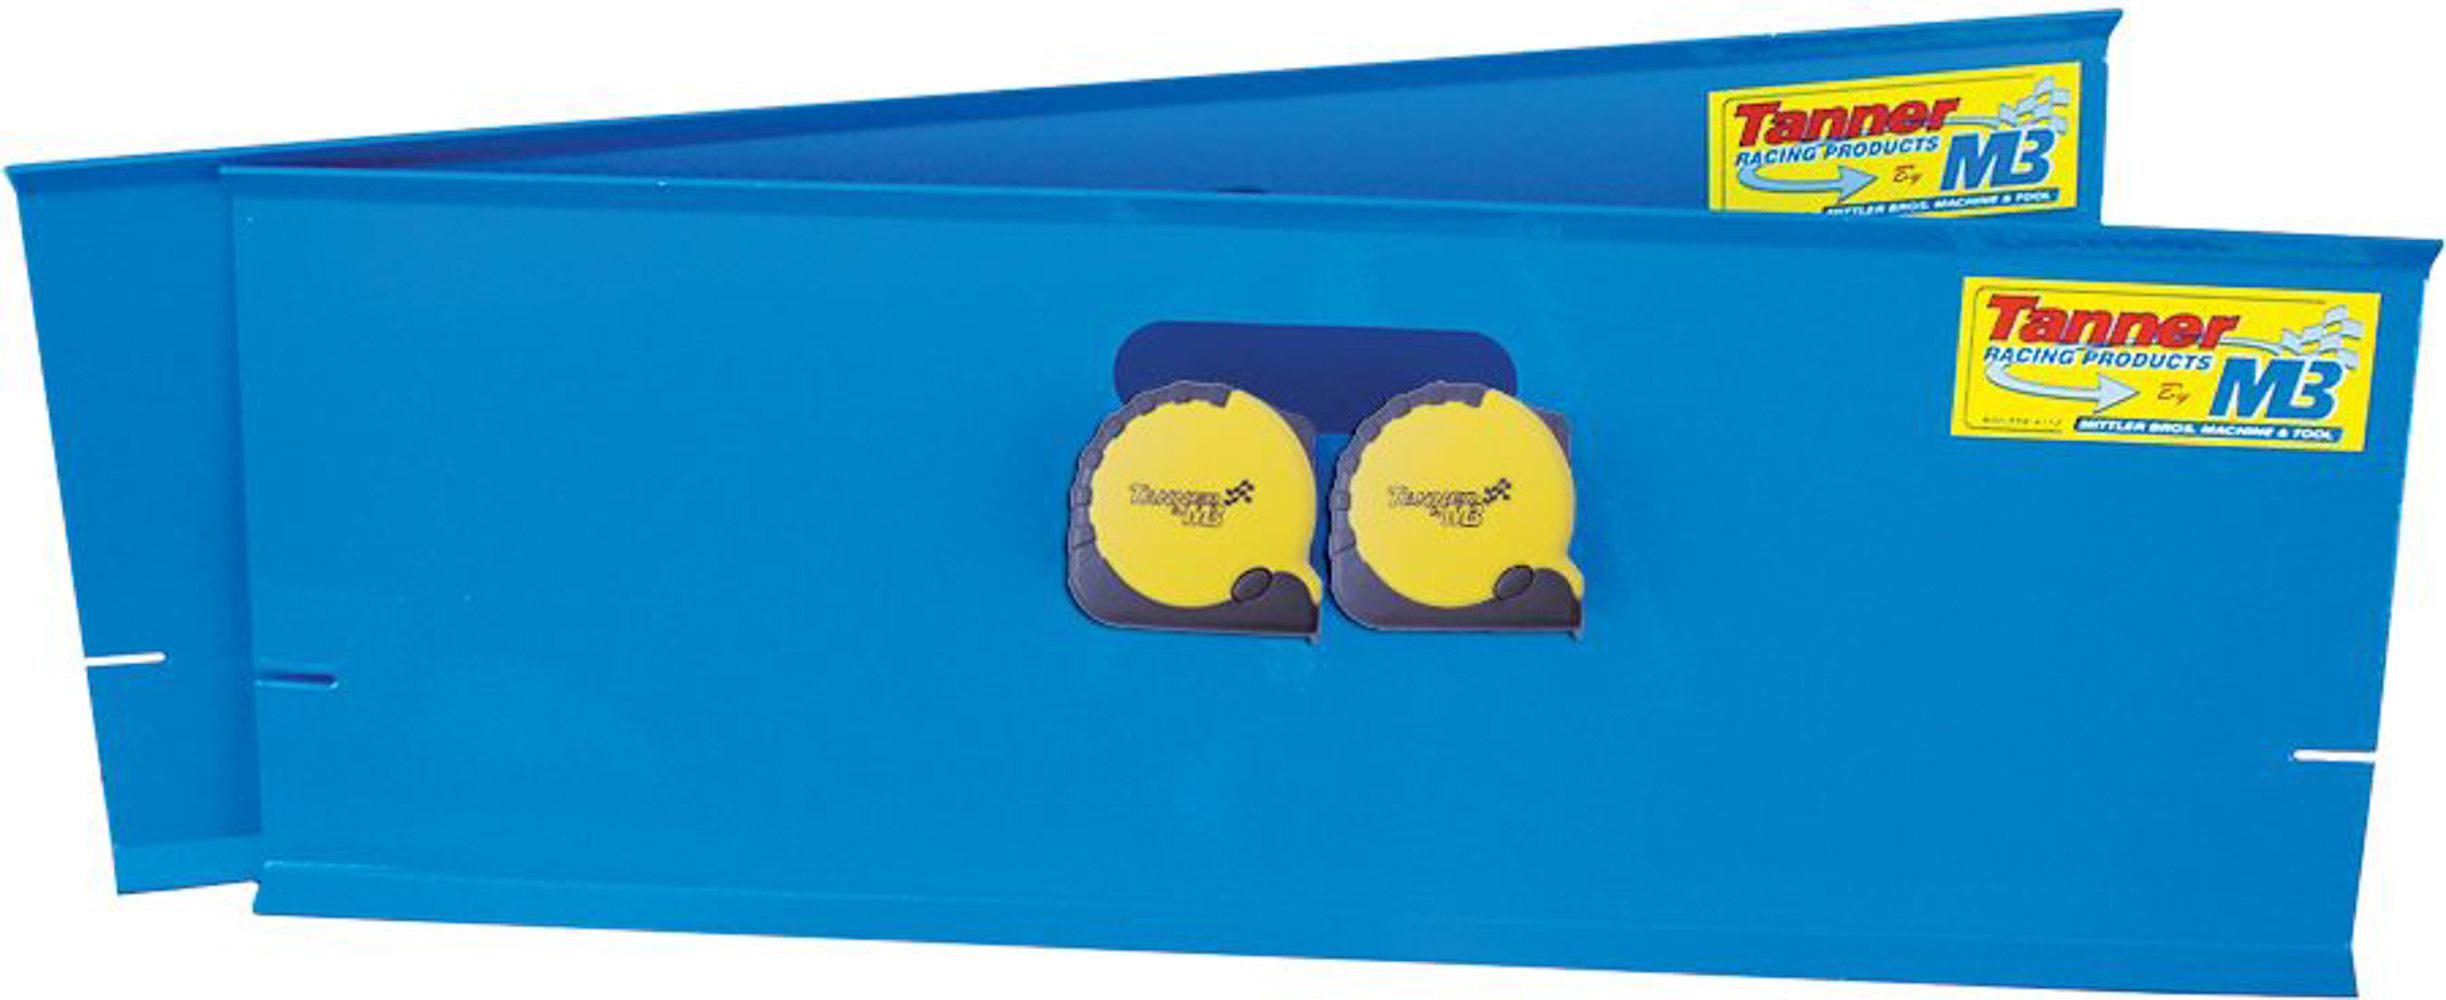 Tanner 56200 Toe-In Plates, 2 Plates, 2 Tape Measures, Aluminum, Blue Anodize, Kit